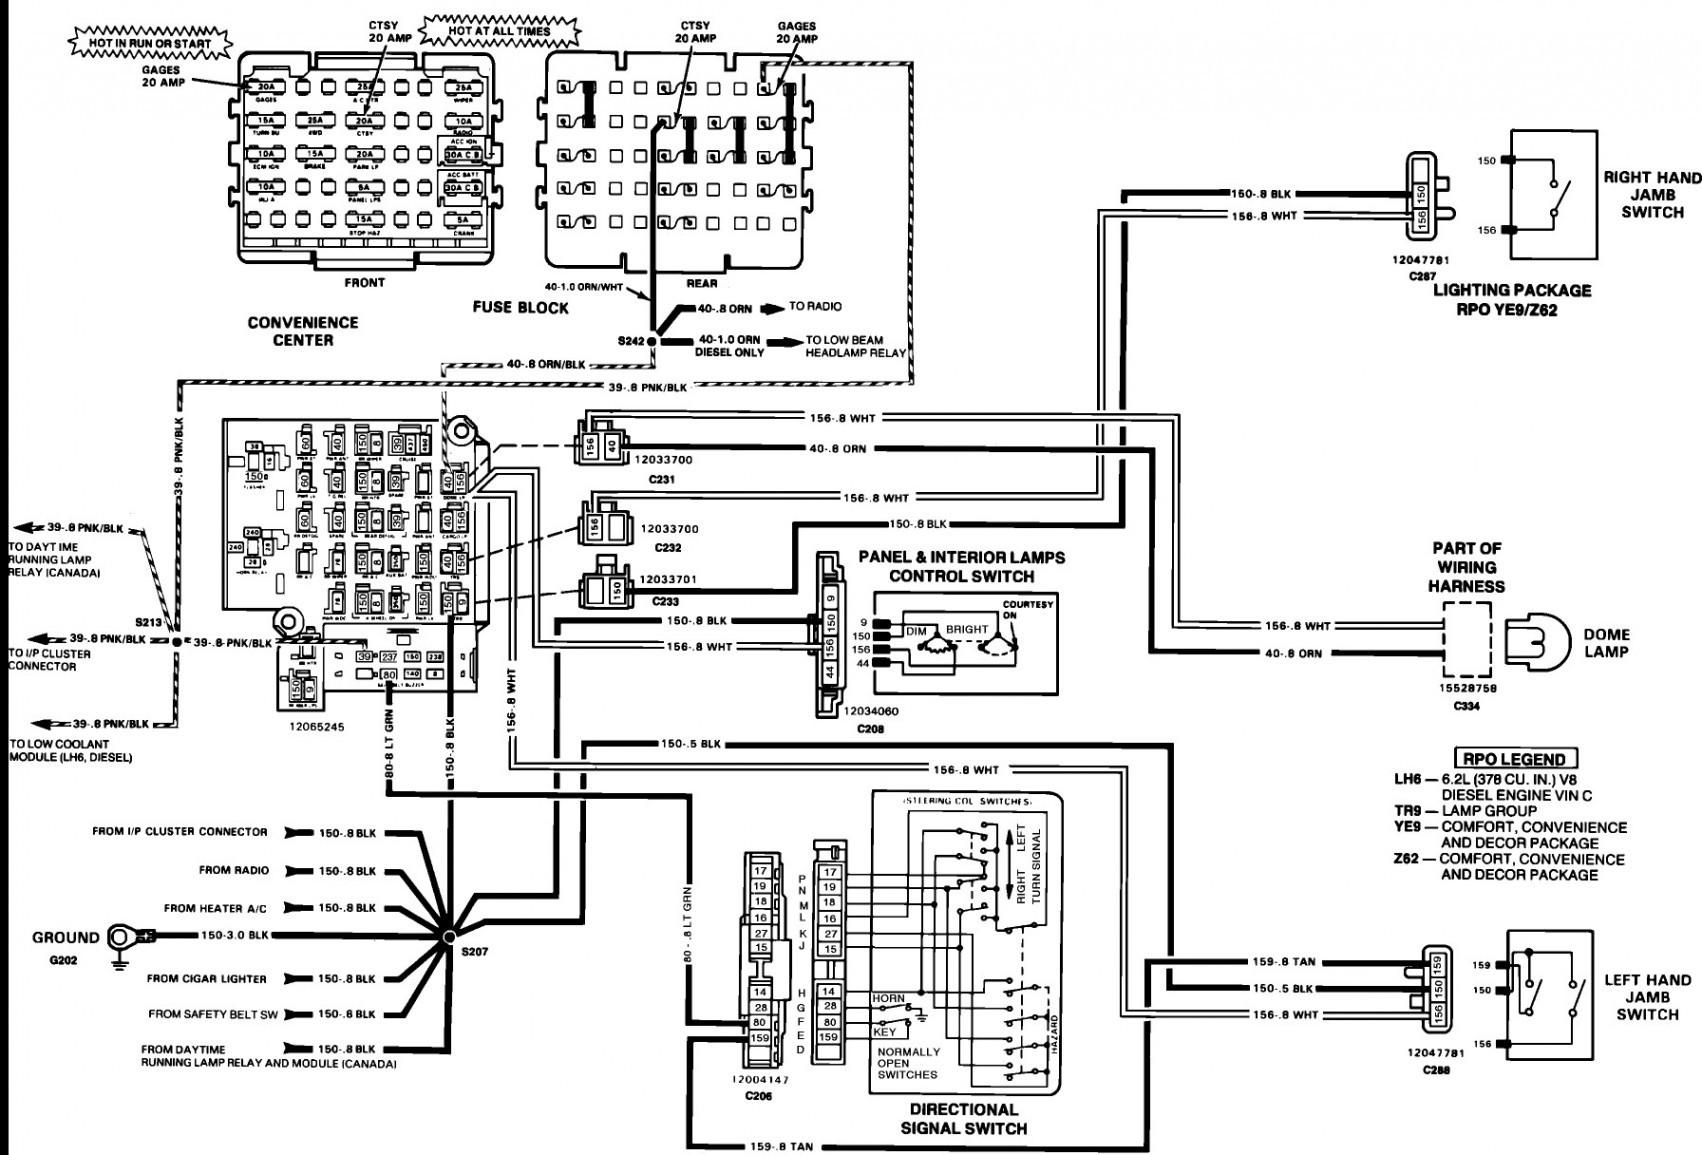 1984 chevy truck fuse box diagram my wiring diagram